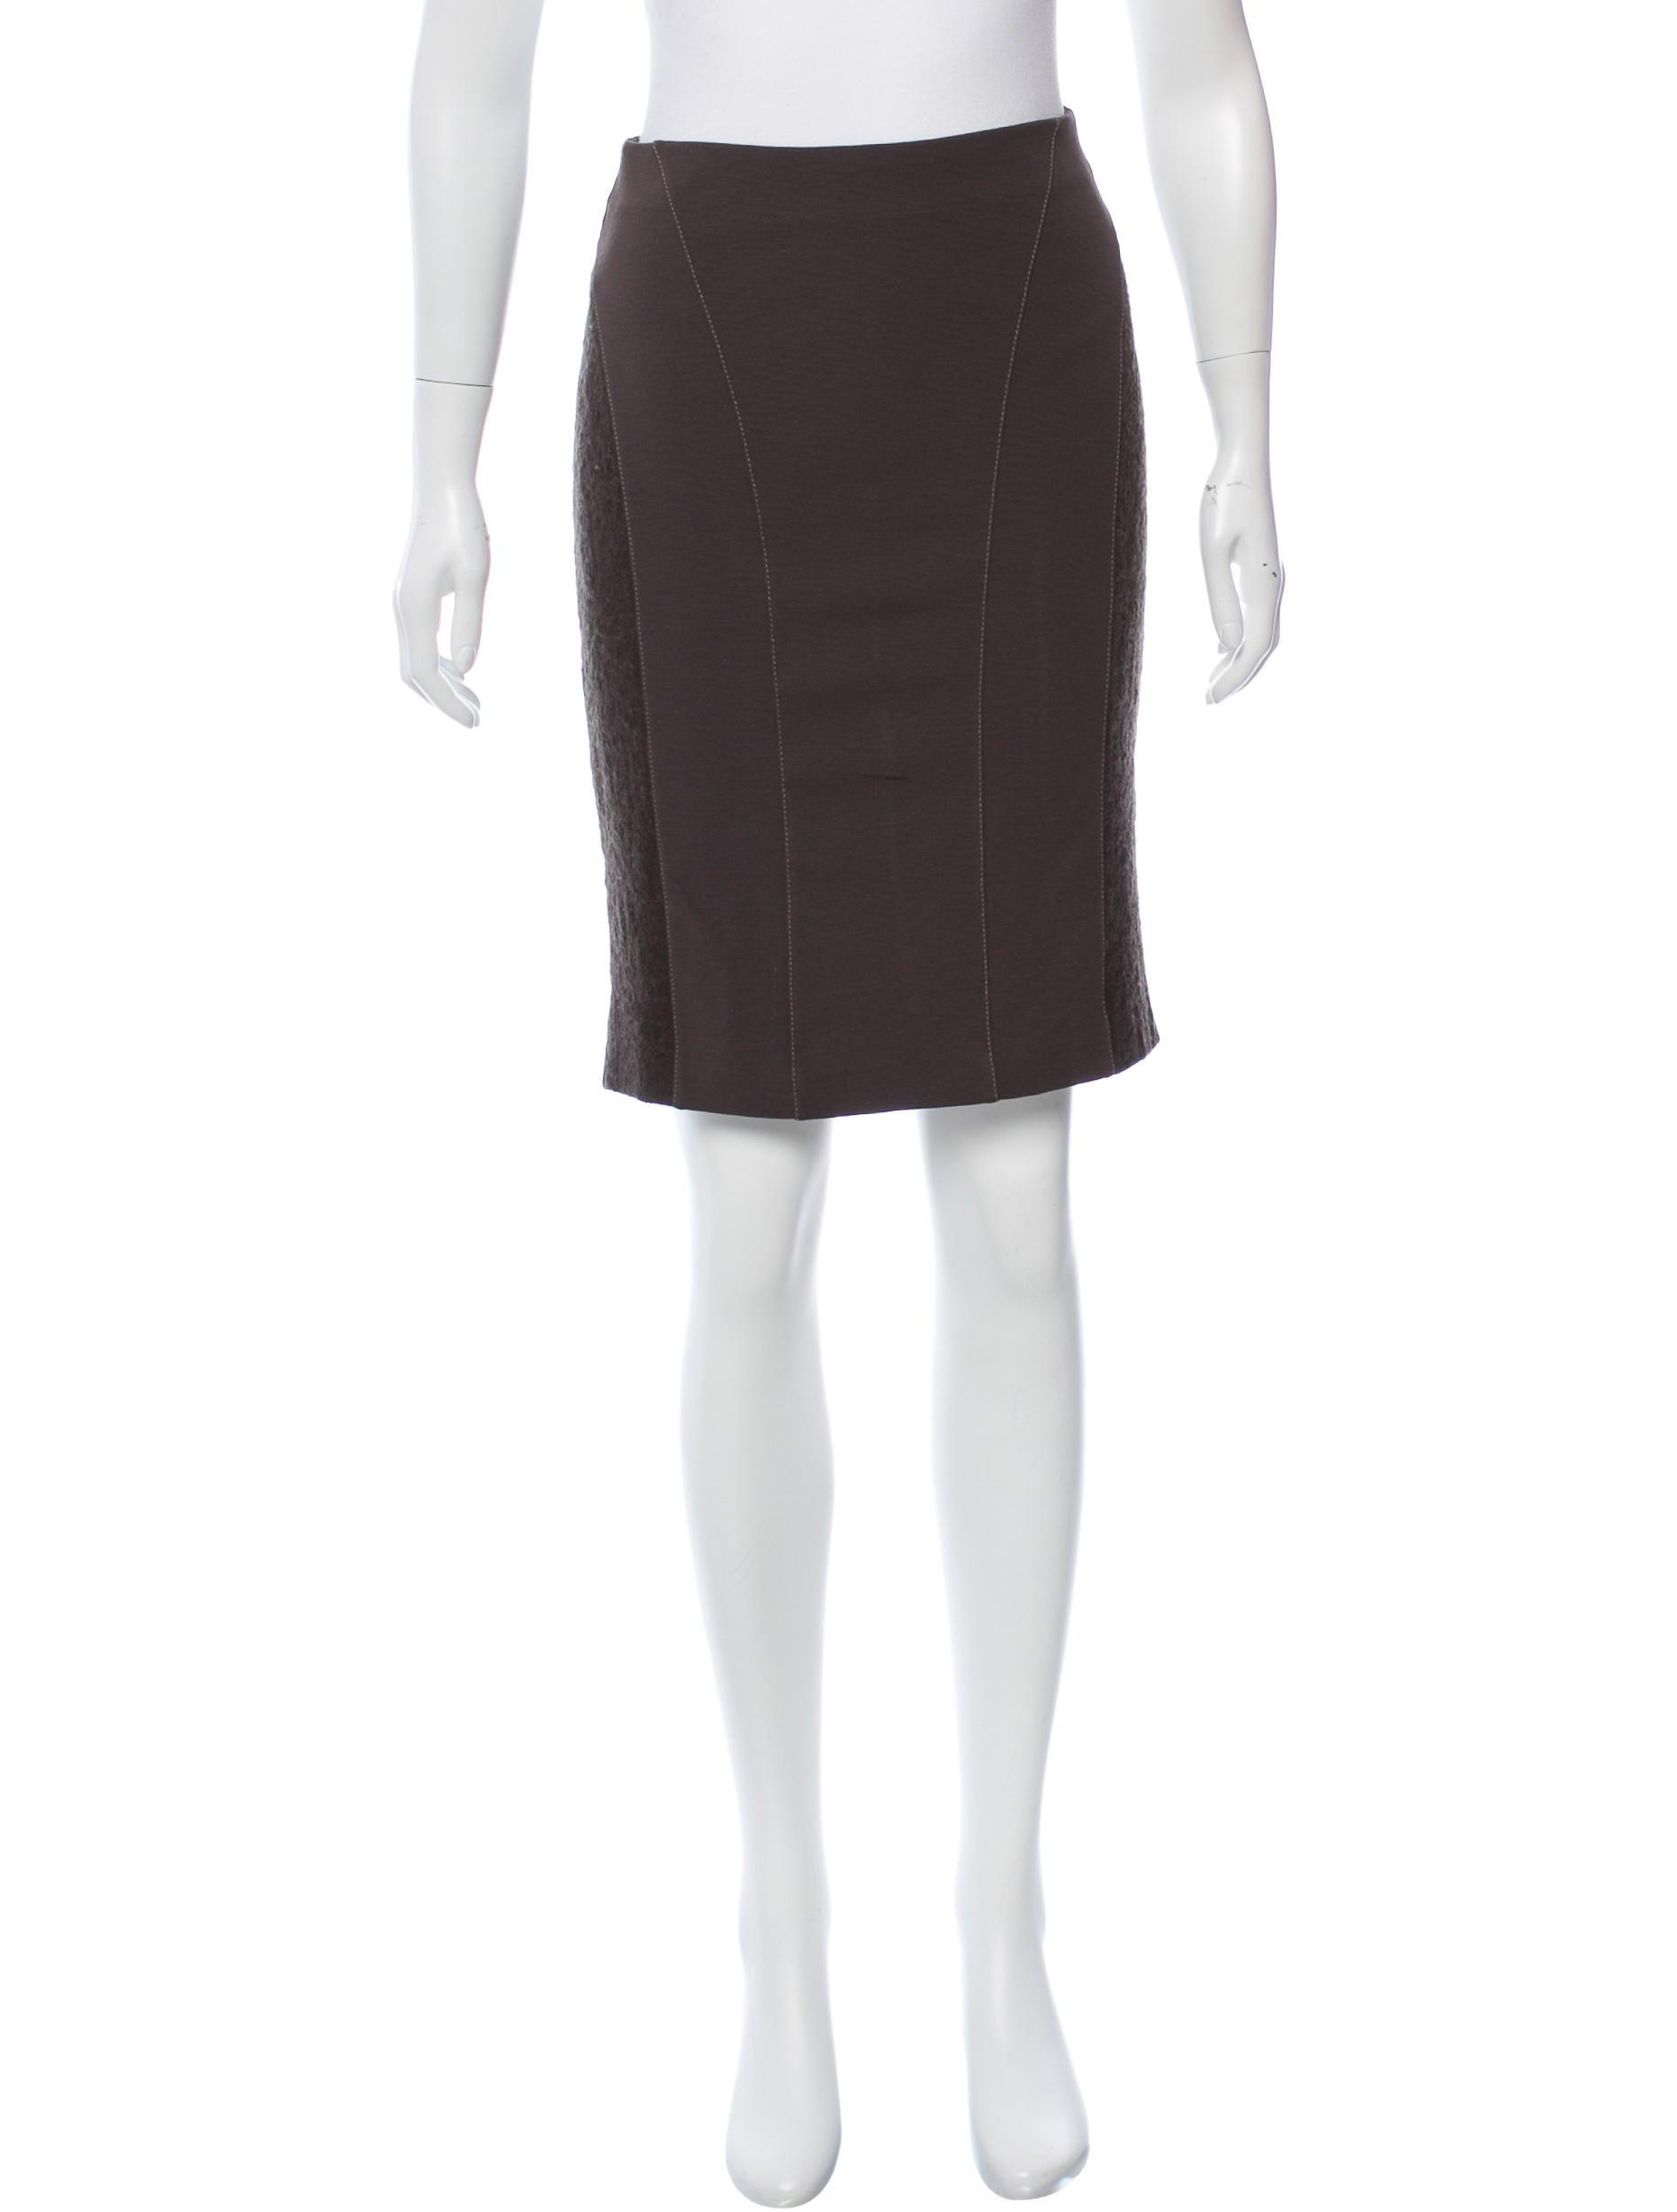 Blumarine Knit Pencil Skirt - Clothing - BLU25698 | The ...